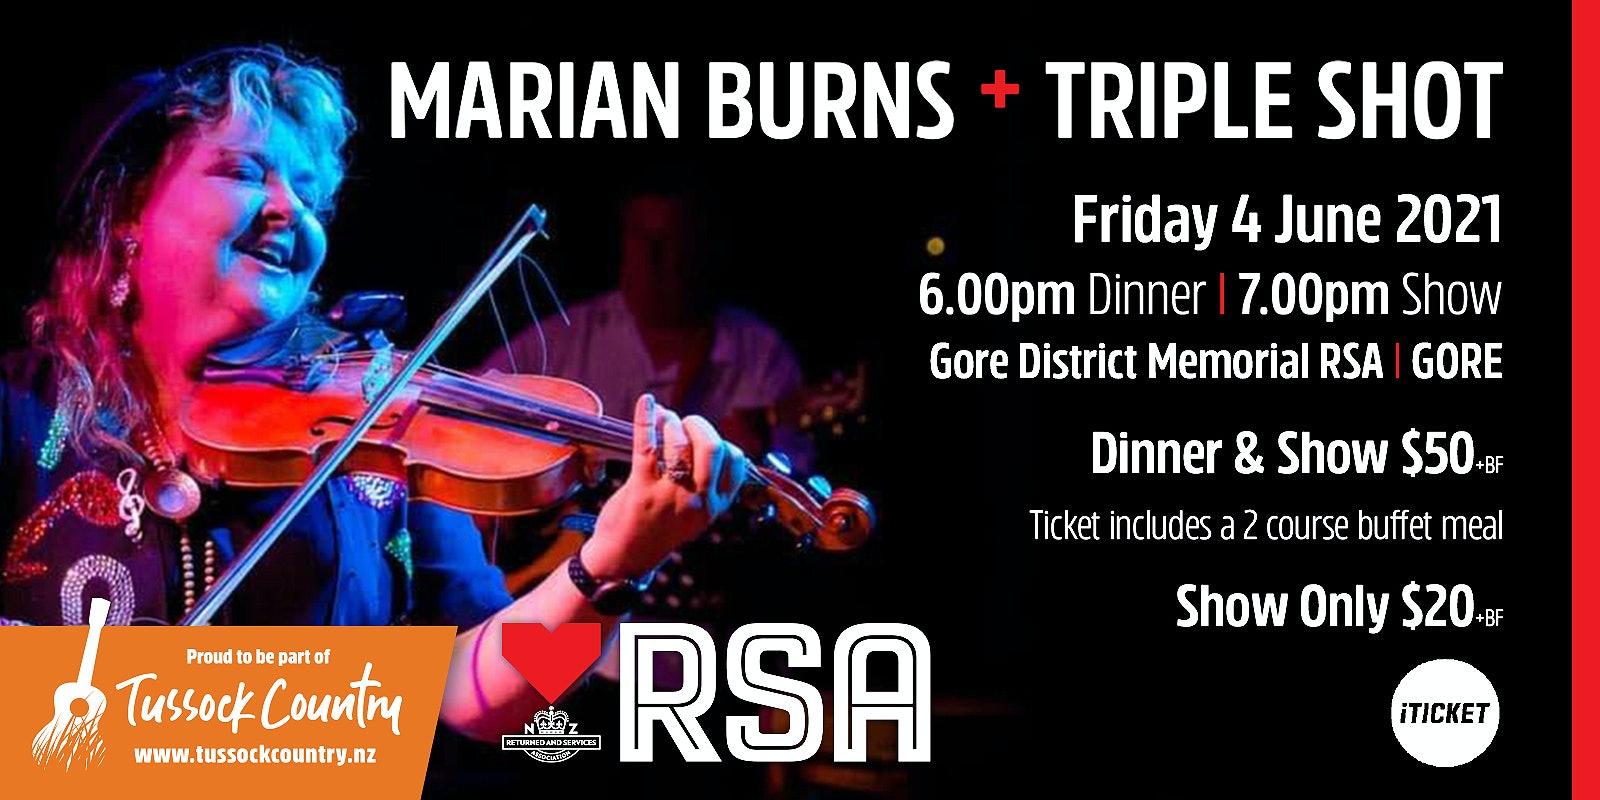 Marian Burns + Triple Shot